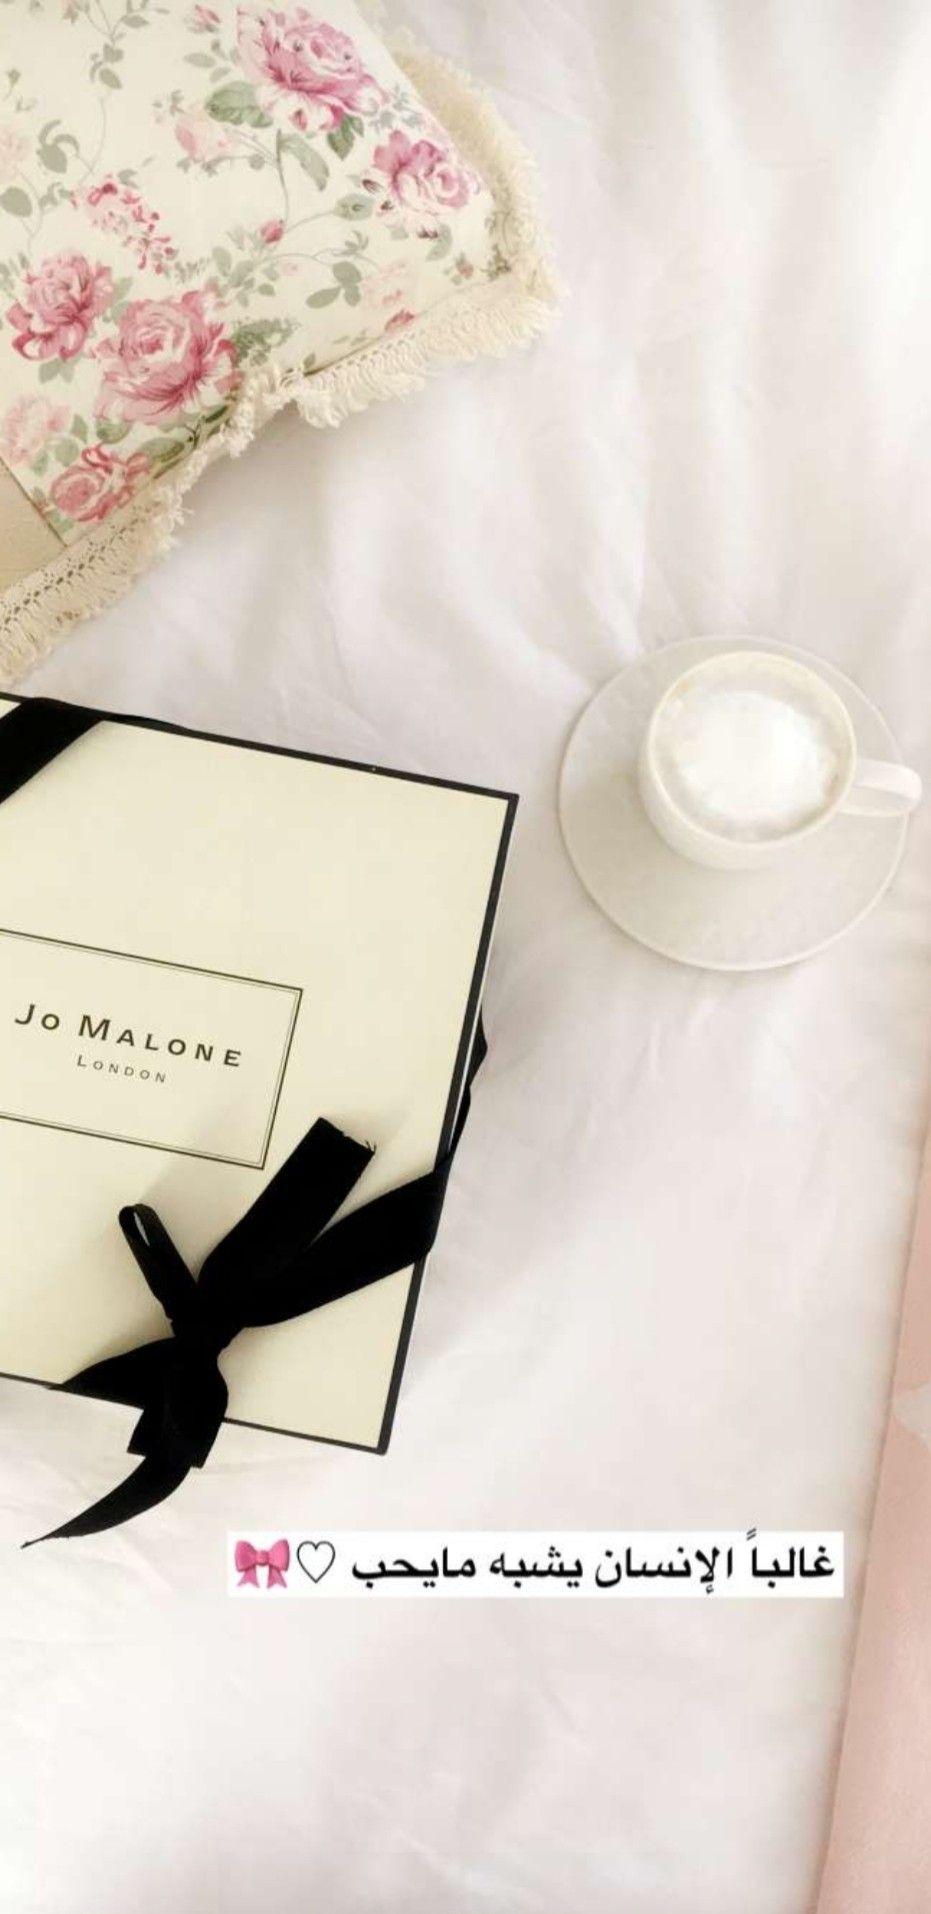 Pin By بوح 511 On Islam Jo Malone London Ted Baker Icon Bag Jo Malone